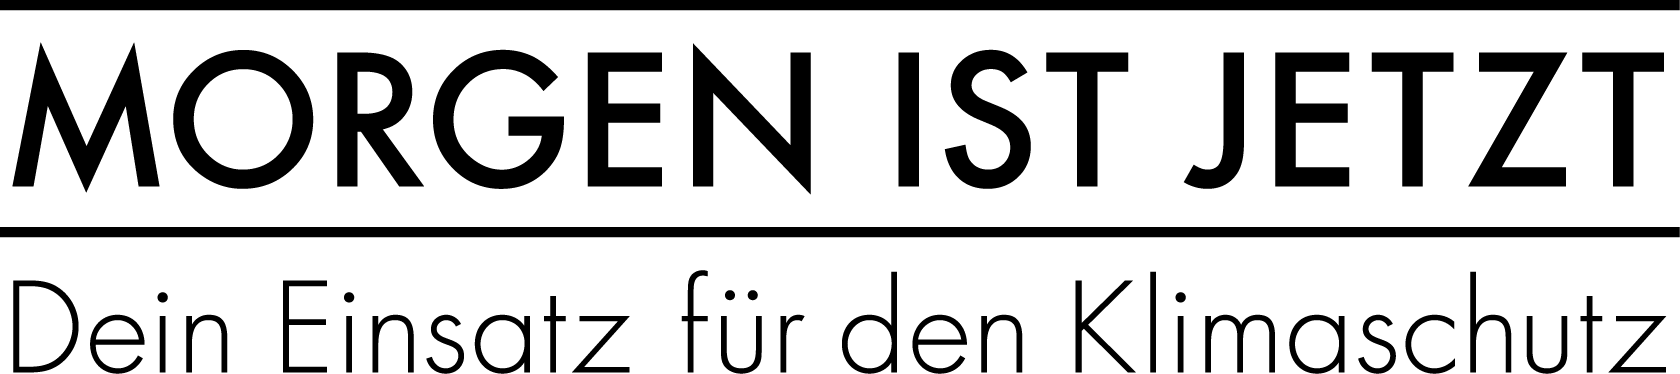 Luminale_keyvisual_2 RZ